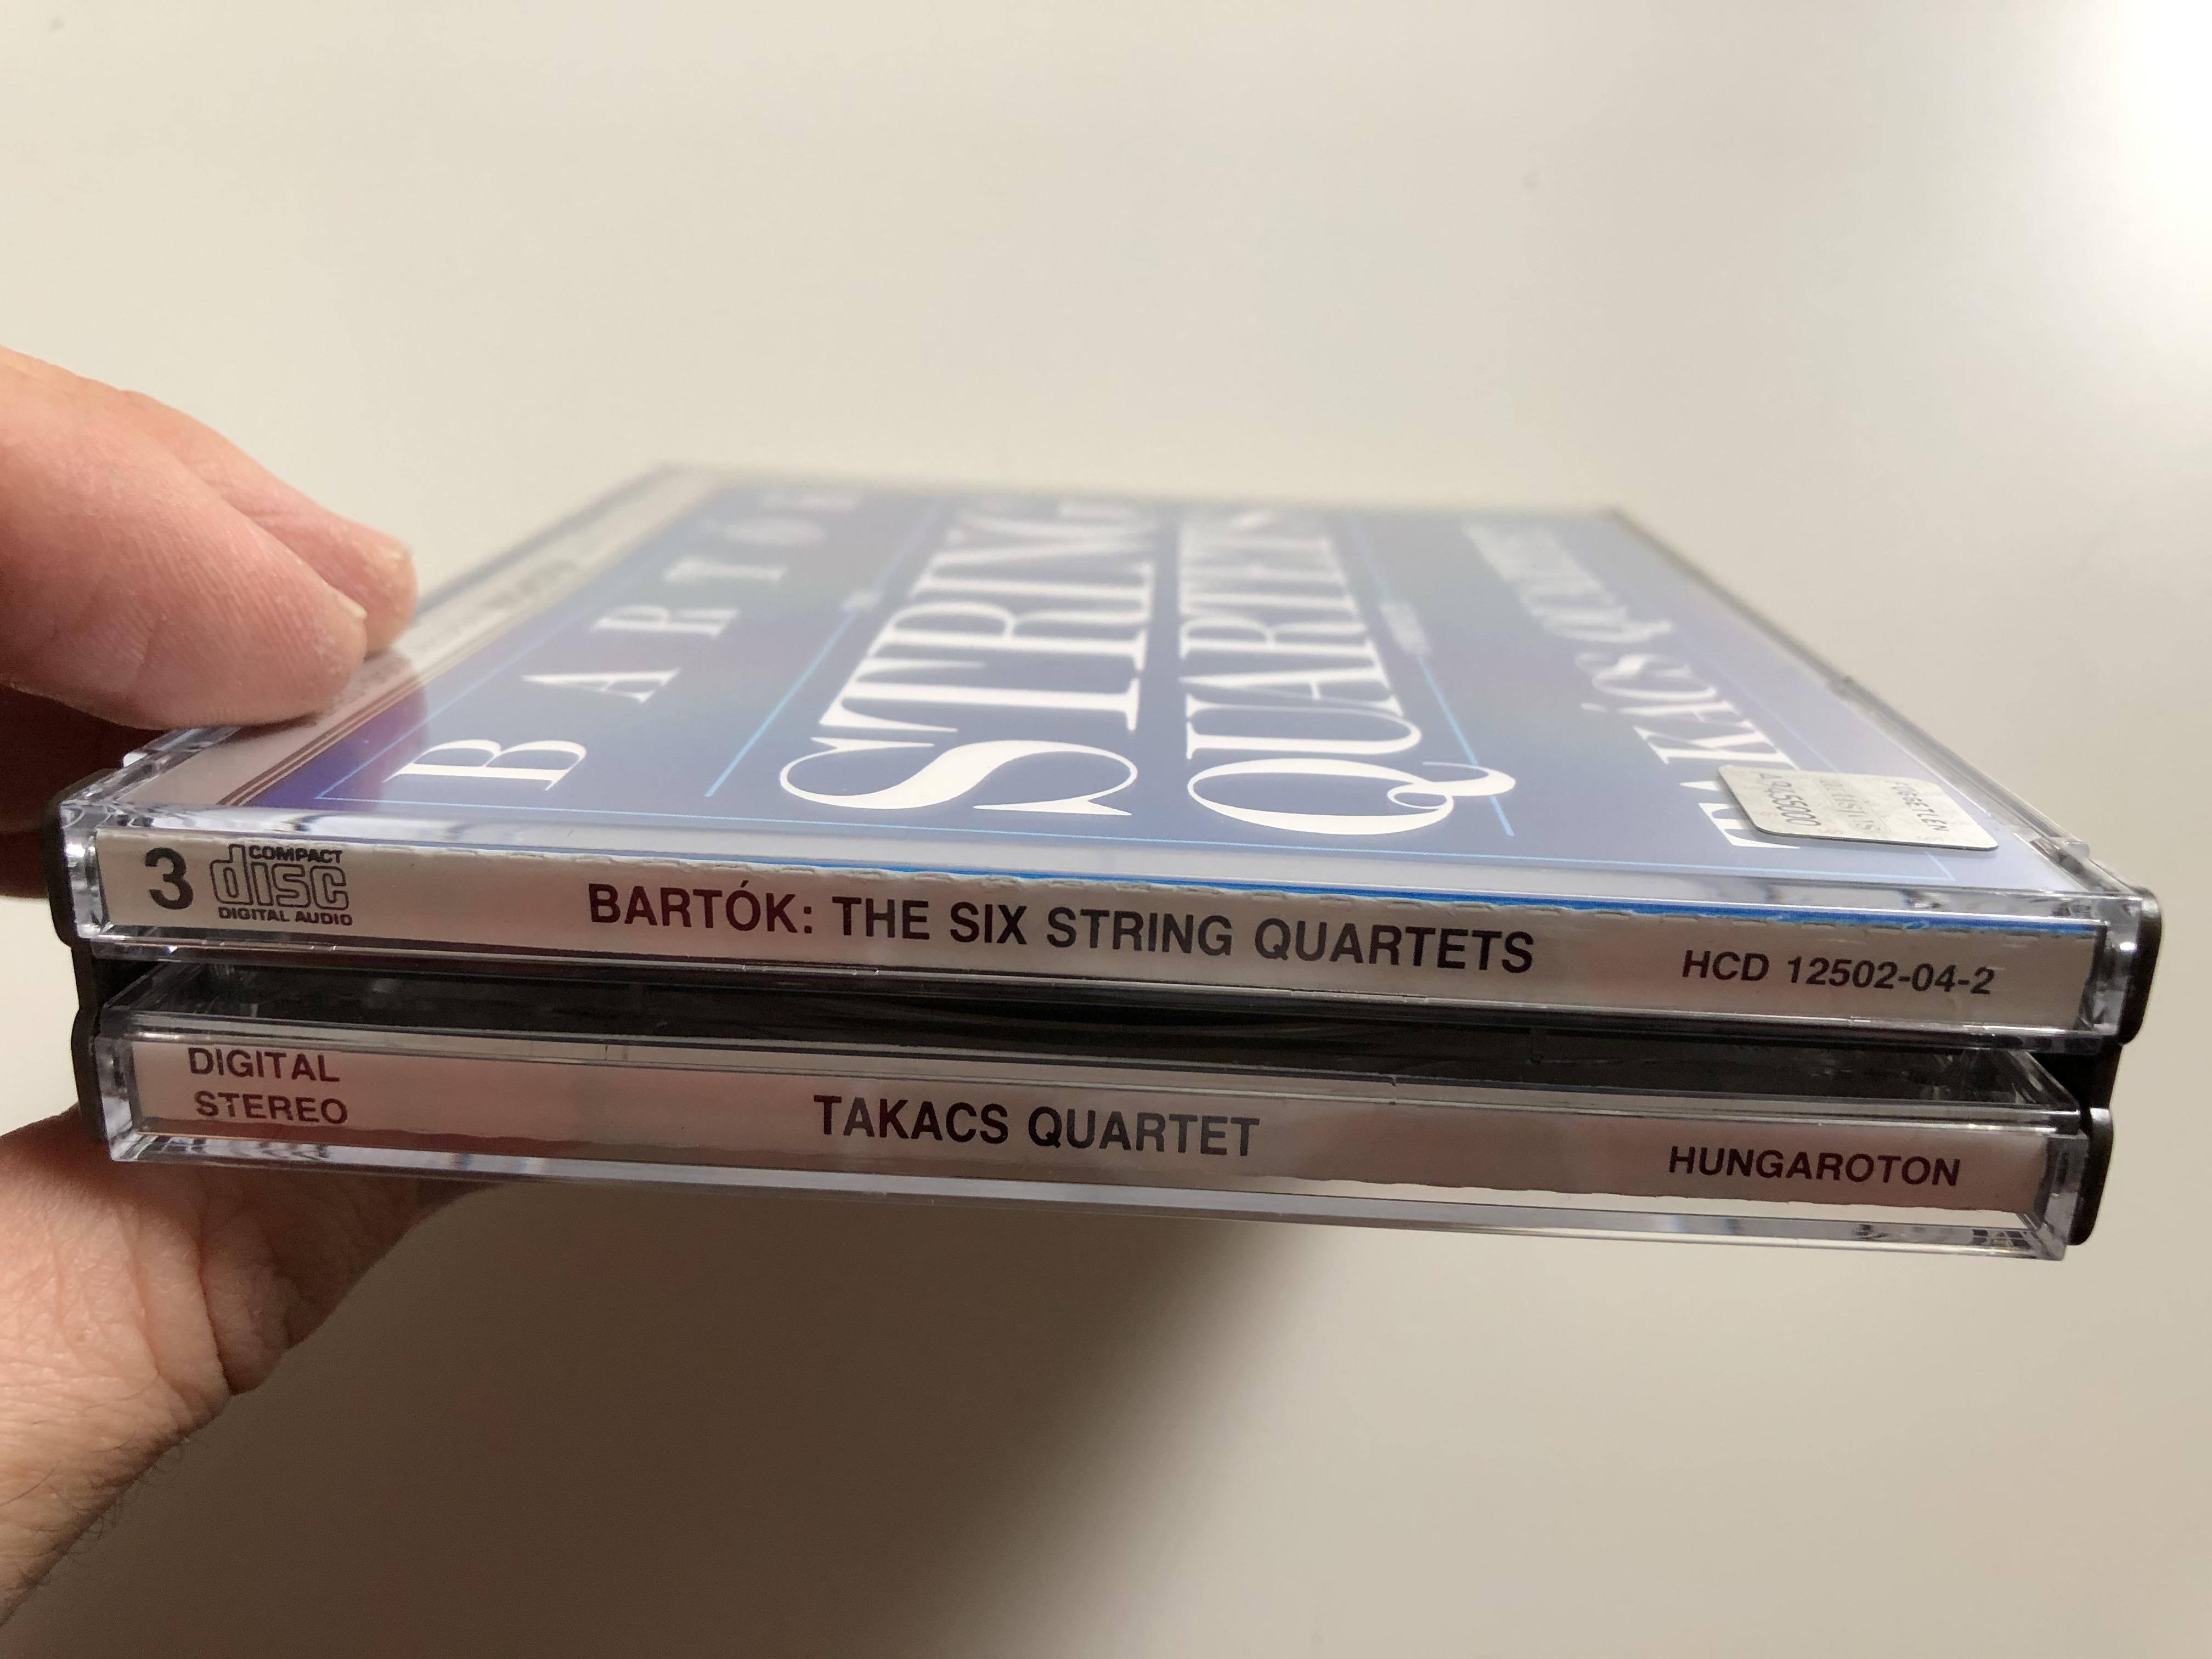 bart-k-the-string-quartets-complete-tak-cs-quartet-hungaroton-3x-audio-cd-1995-stereo-hcd-12502-04-2-6-.jpg